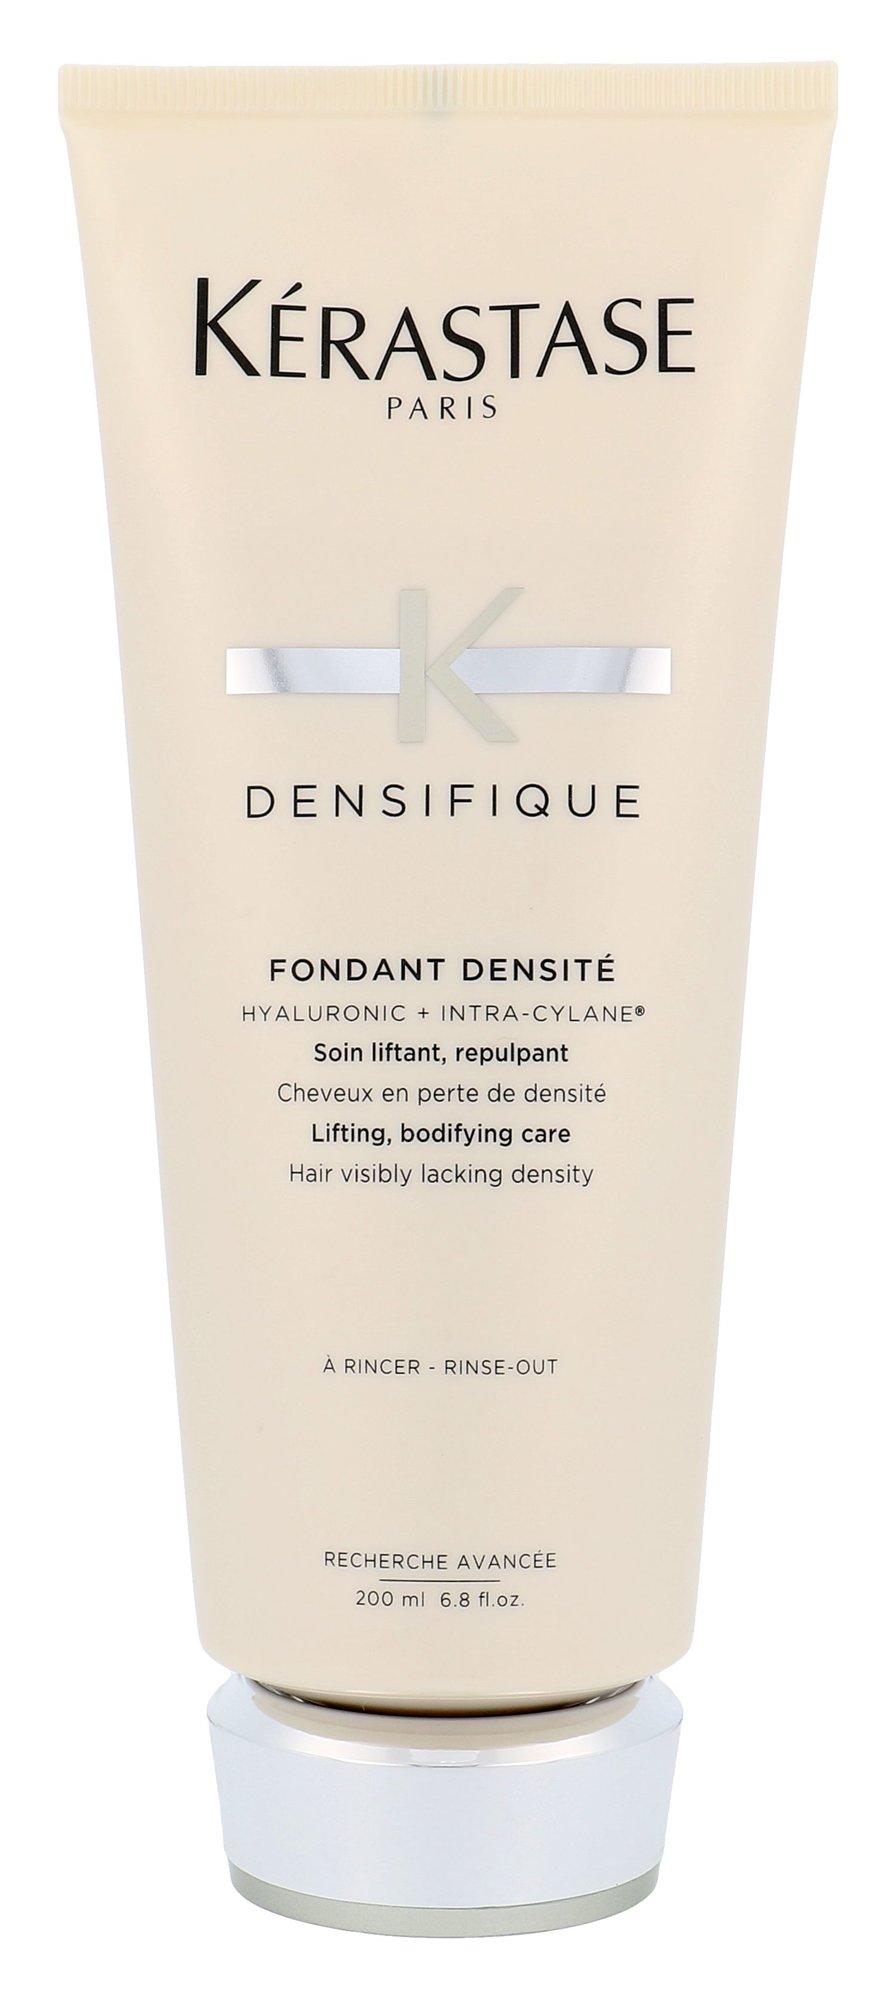 Kérastase Densifique Cosmetic 200ml  Fondant Densité